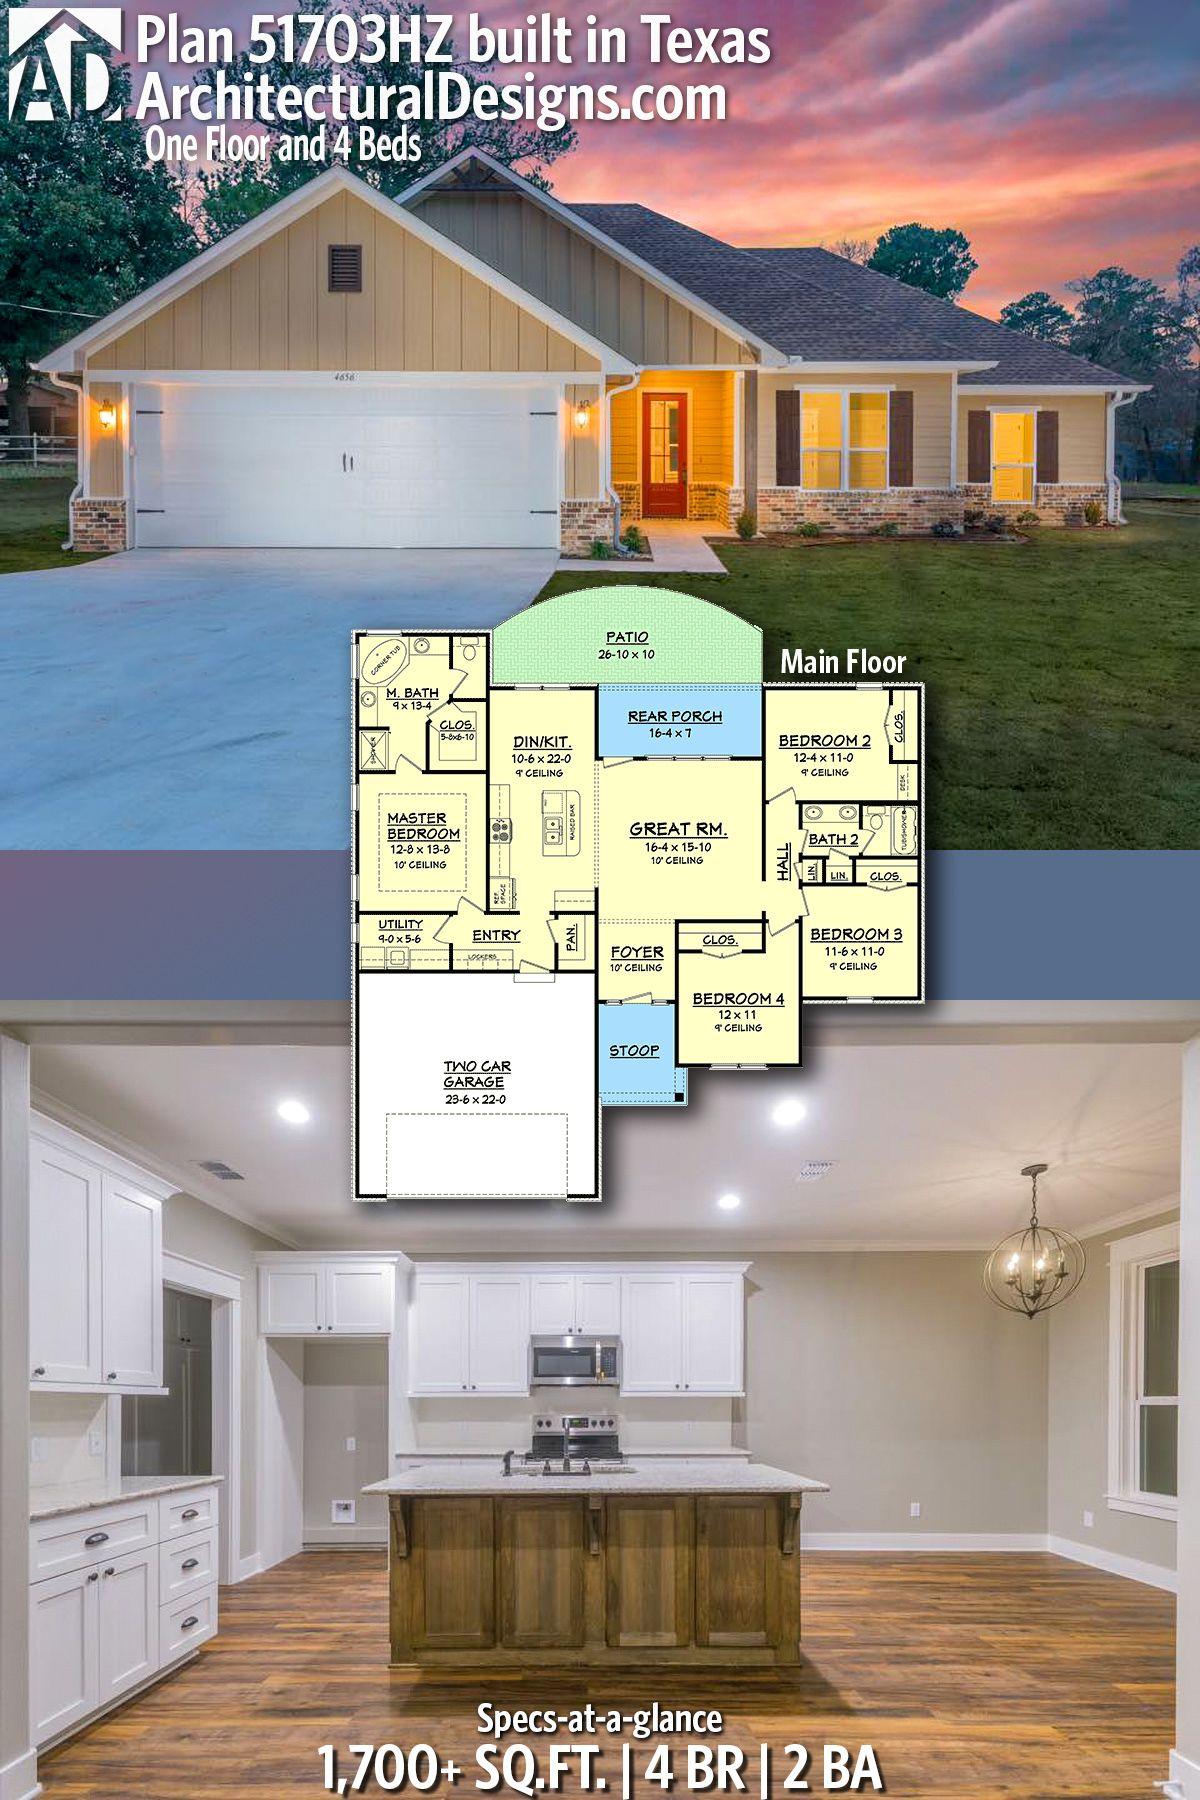 Plan 51703HZ: One Floor and 4 Beds